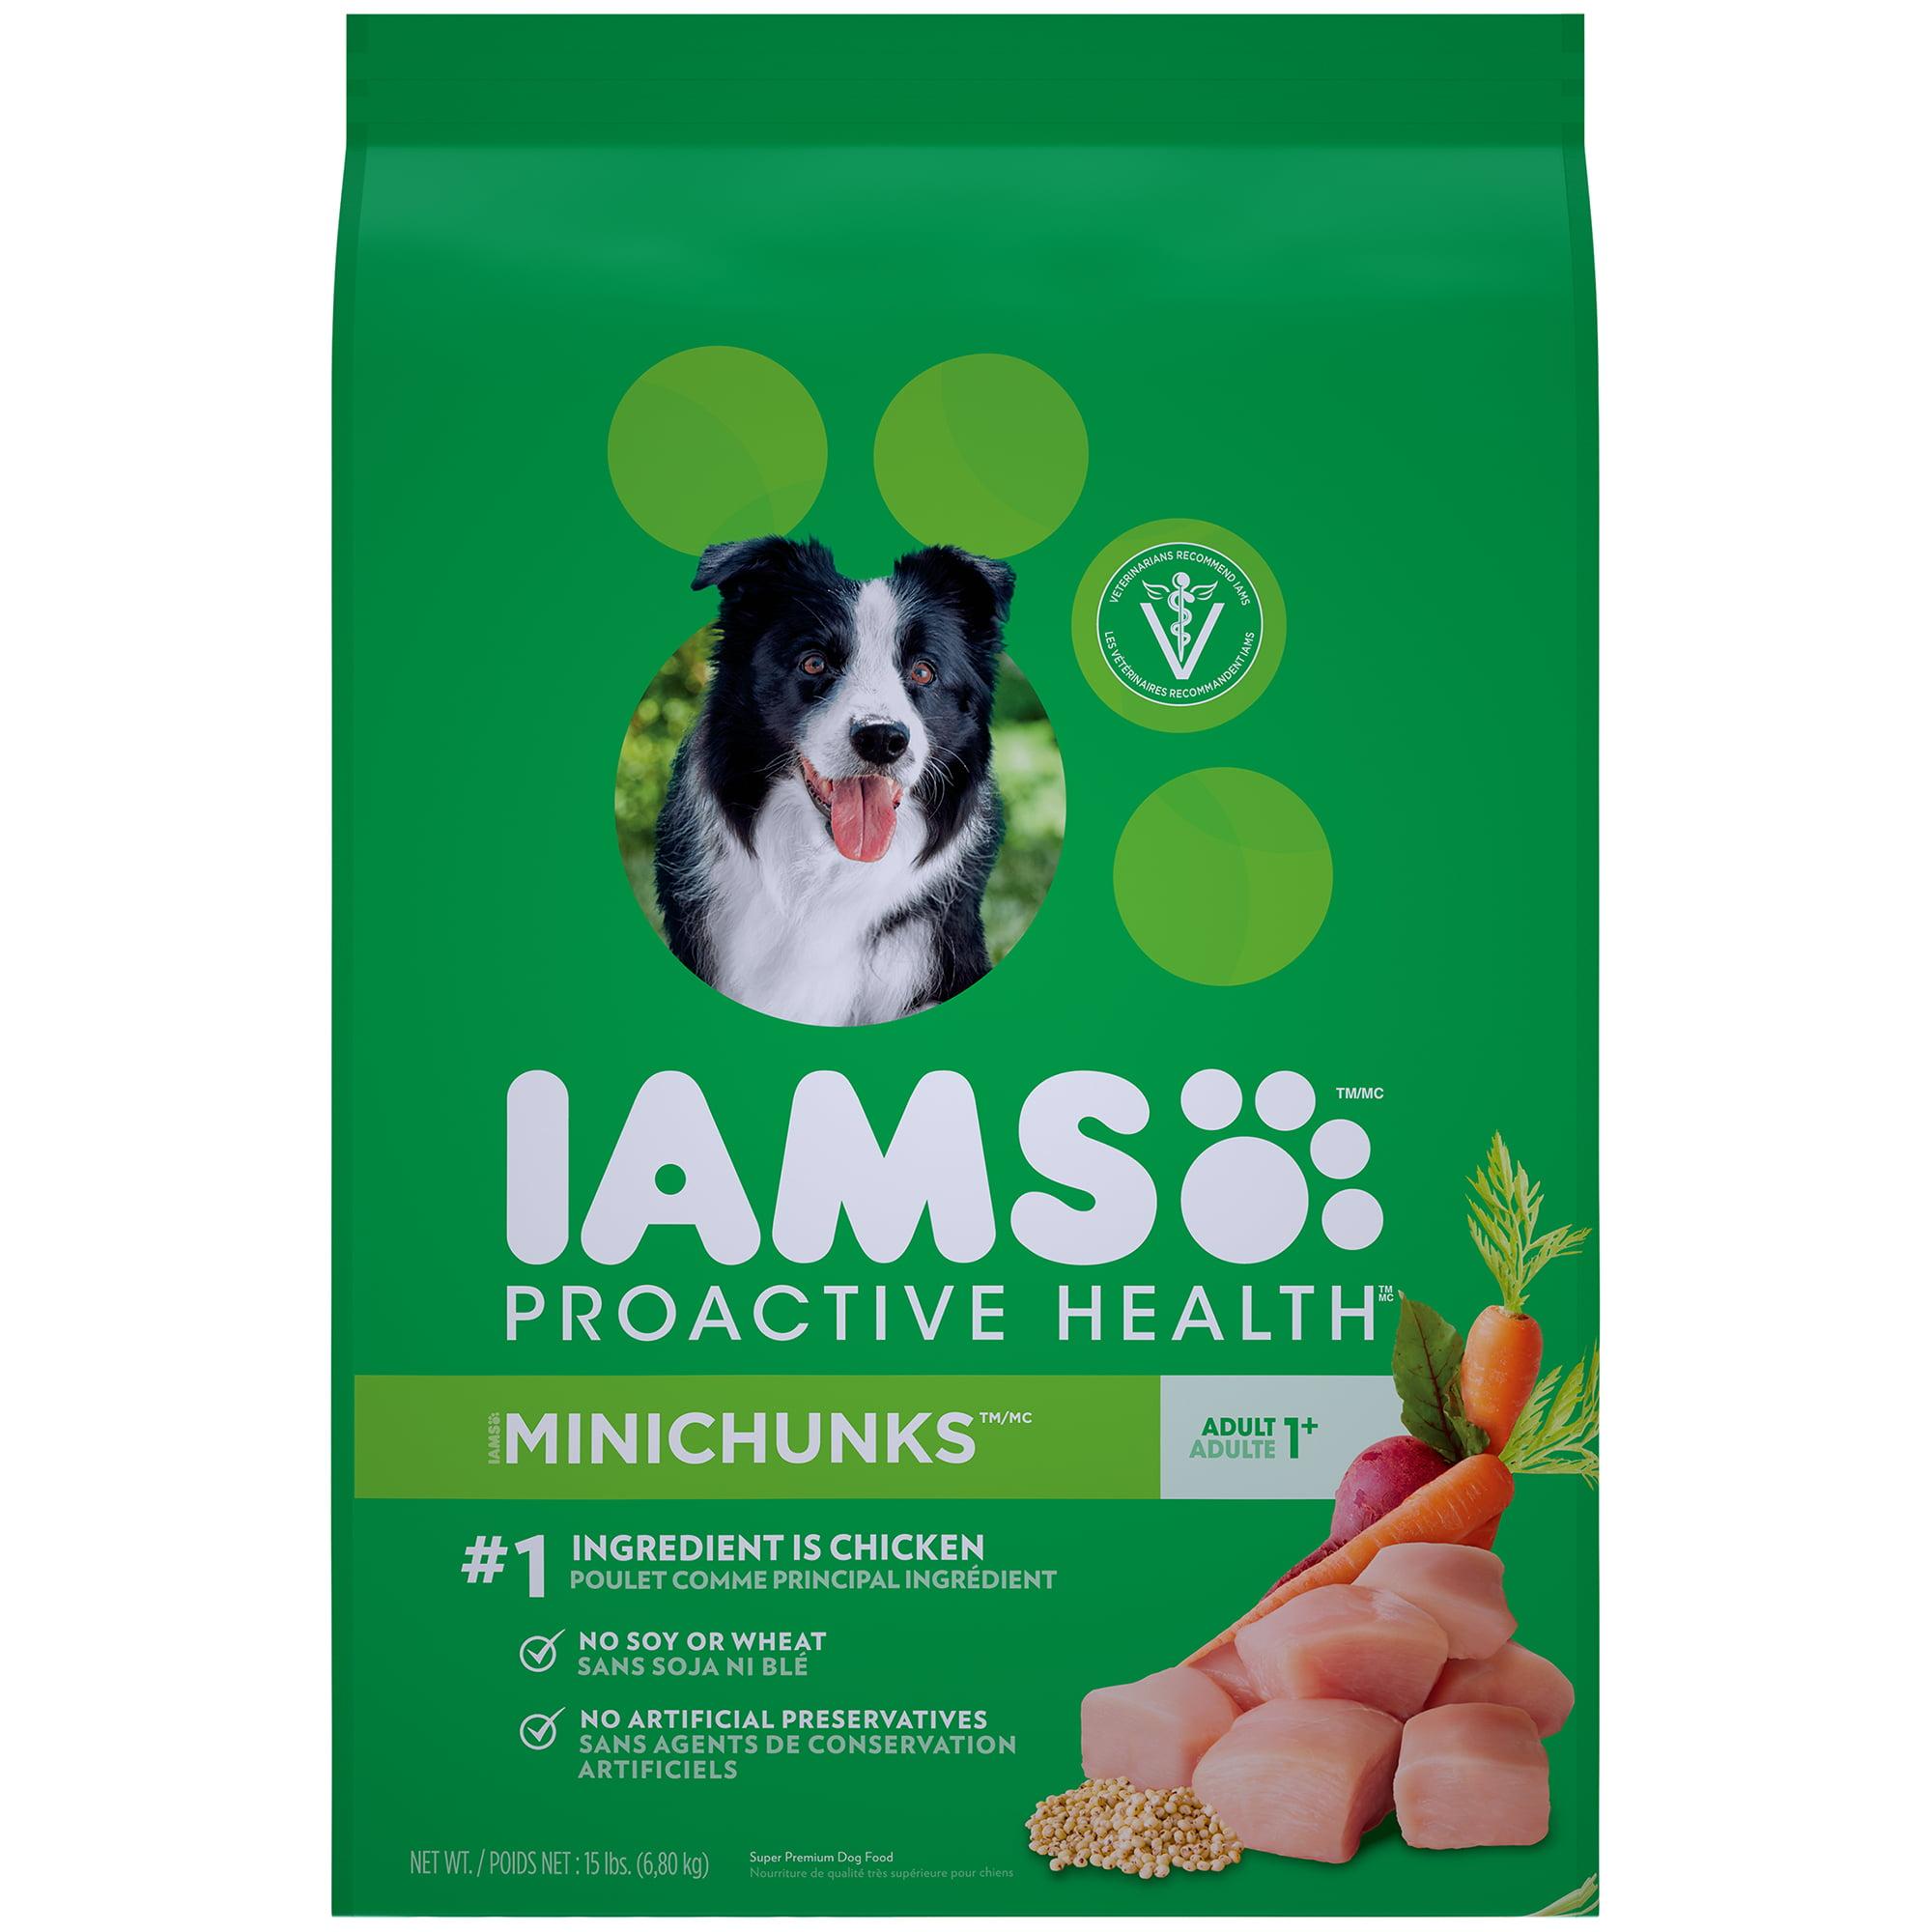 IAMS PROACTIVE HEALTH Adult Minichunks Dry Dog Food 15 Pounds by Mars Petcare